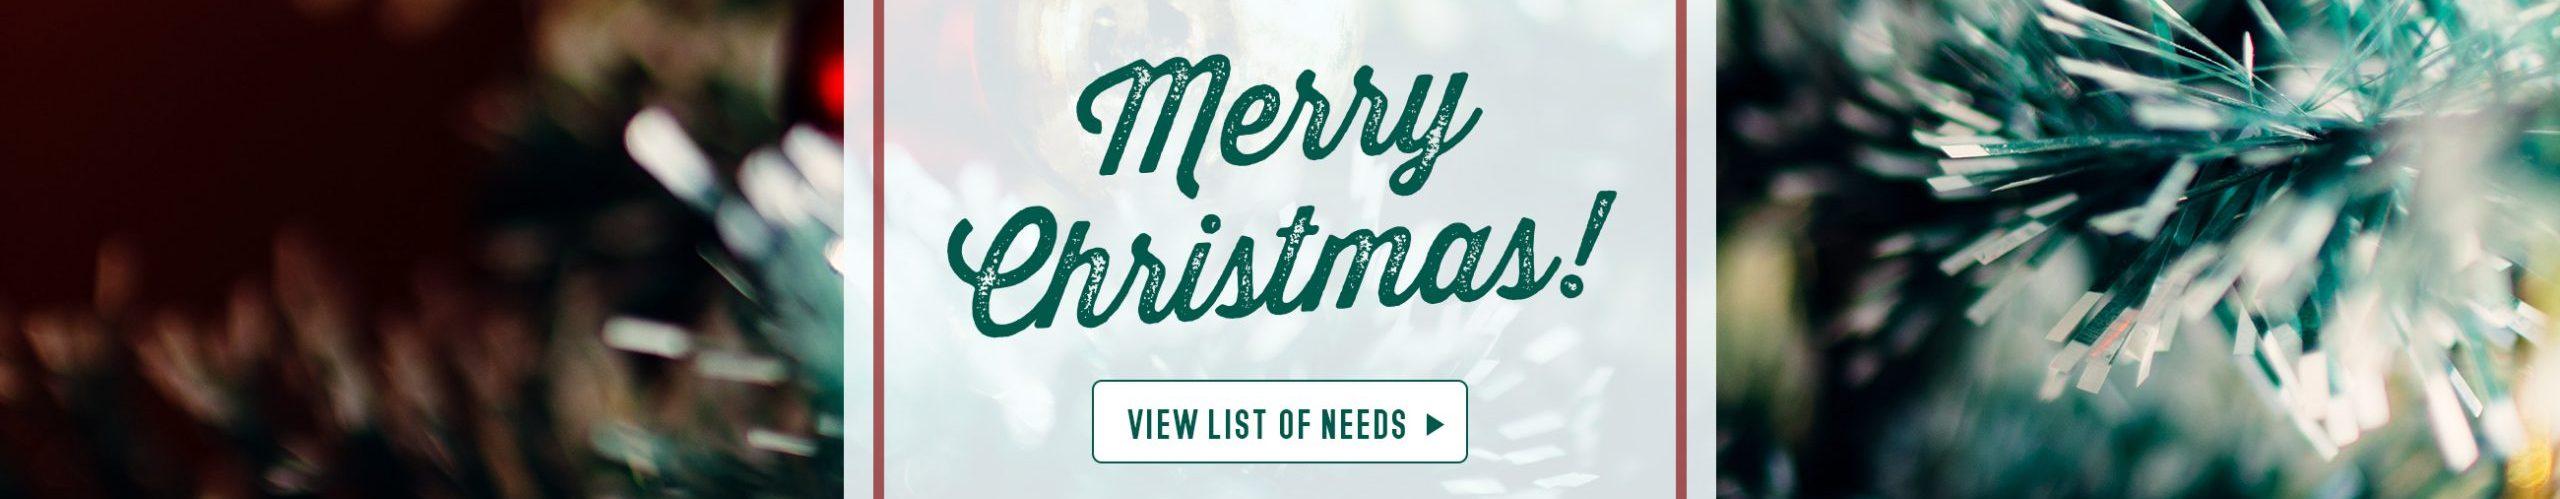 RRM_Christmas_2600x650